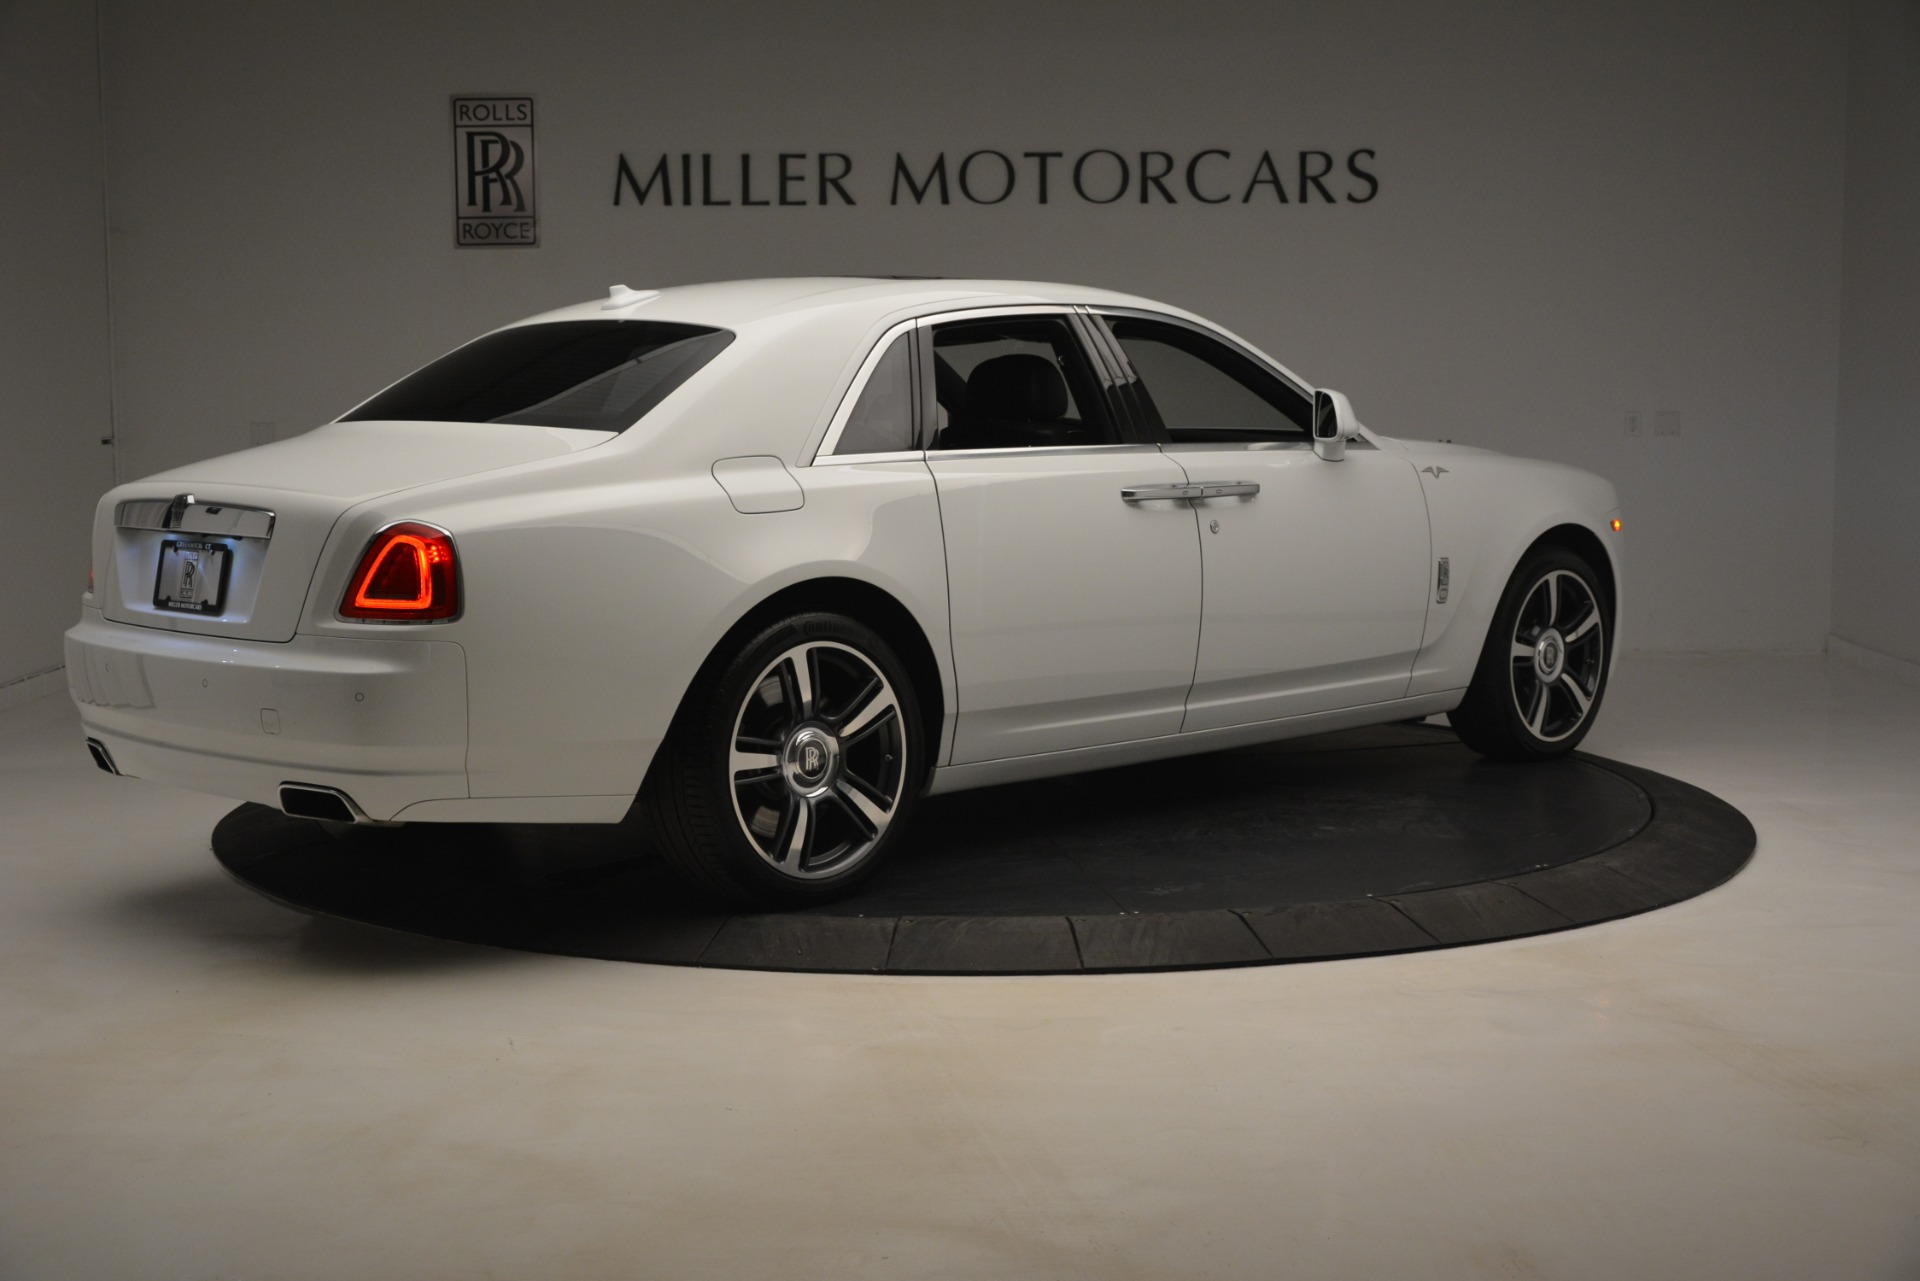 Used 2014 Rolls-Royce Ghost V-Spec For Sale In Westport, CT 2989_p9